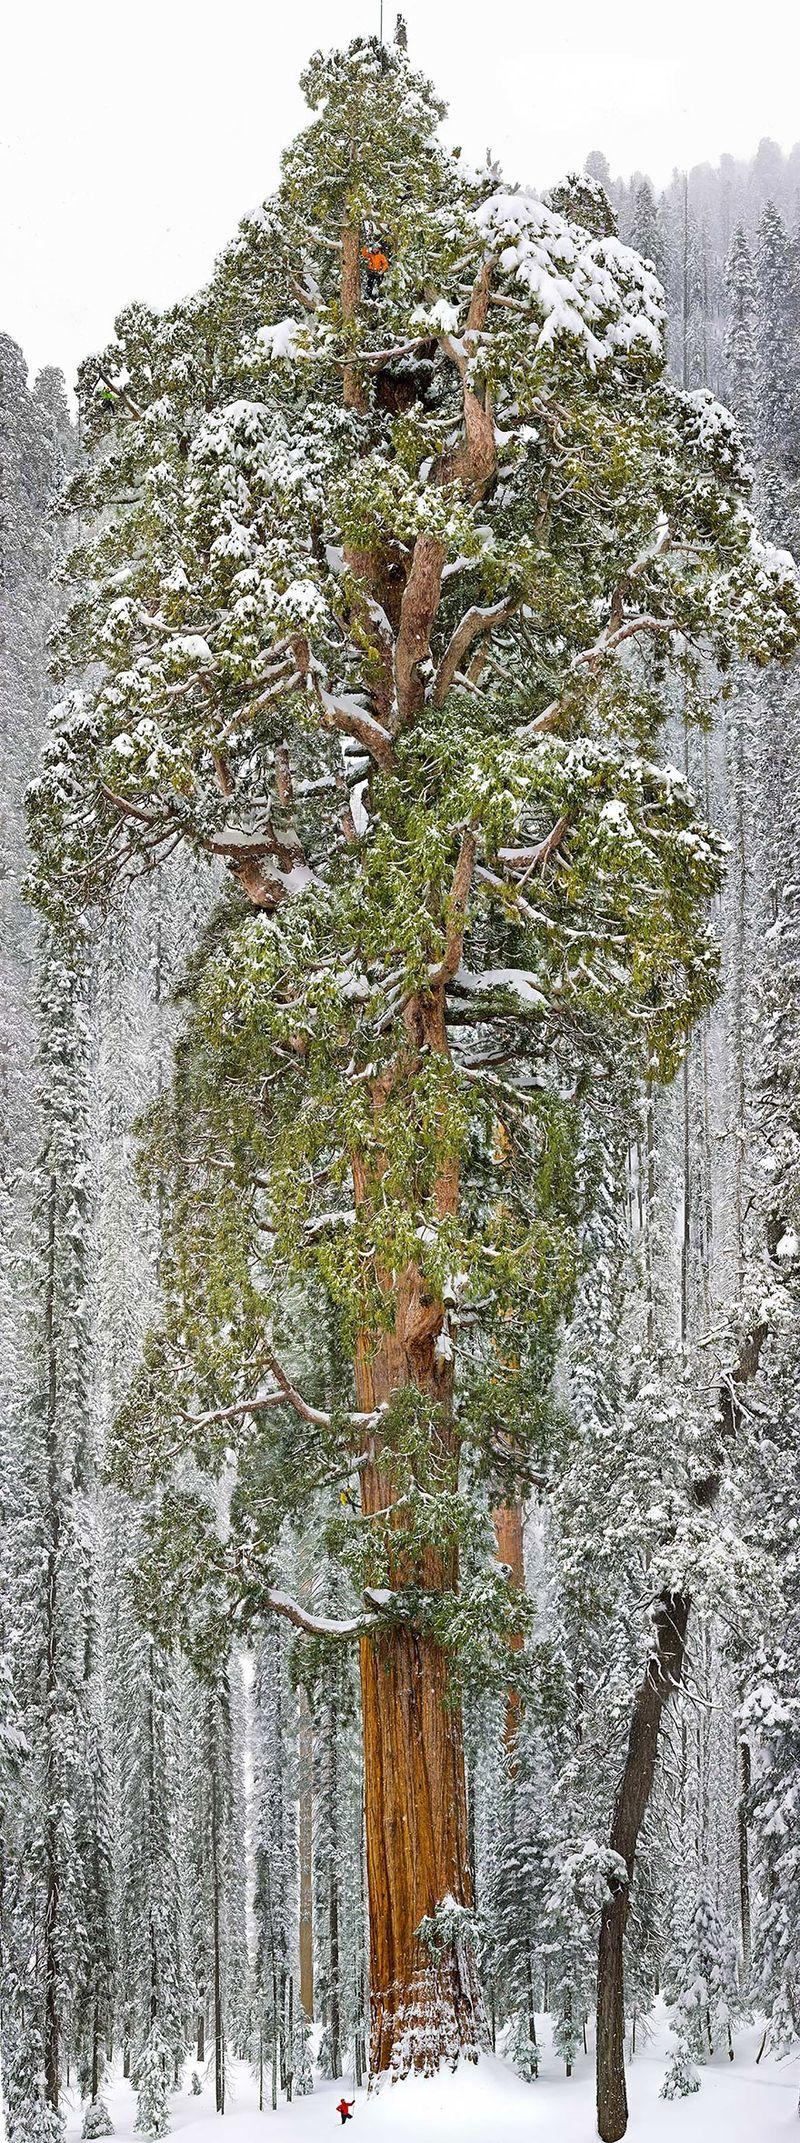 Giant Sequoia, California (241 Feet Tall)